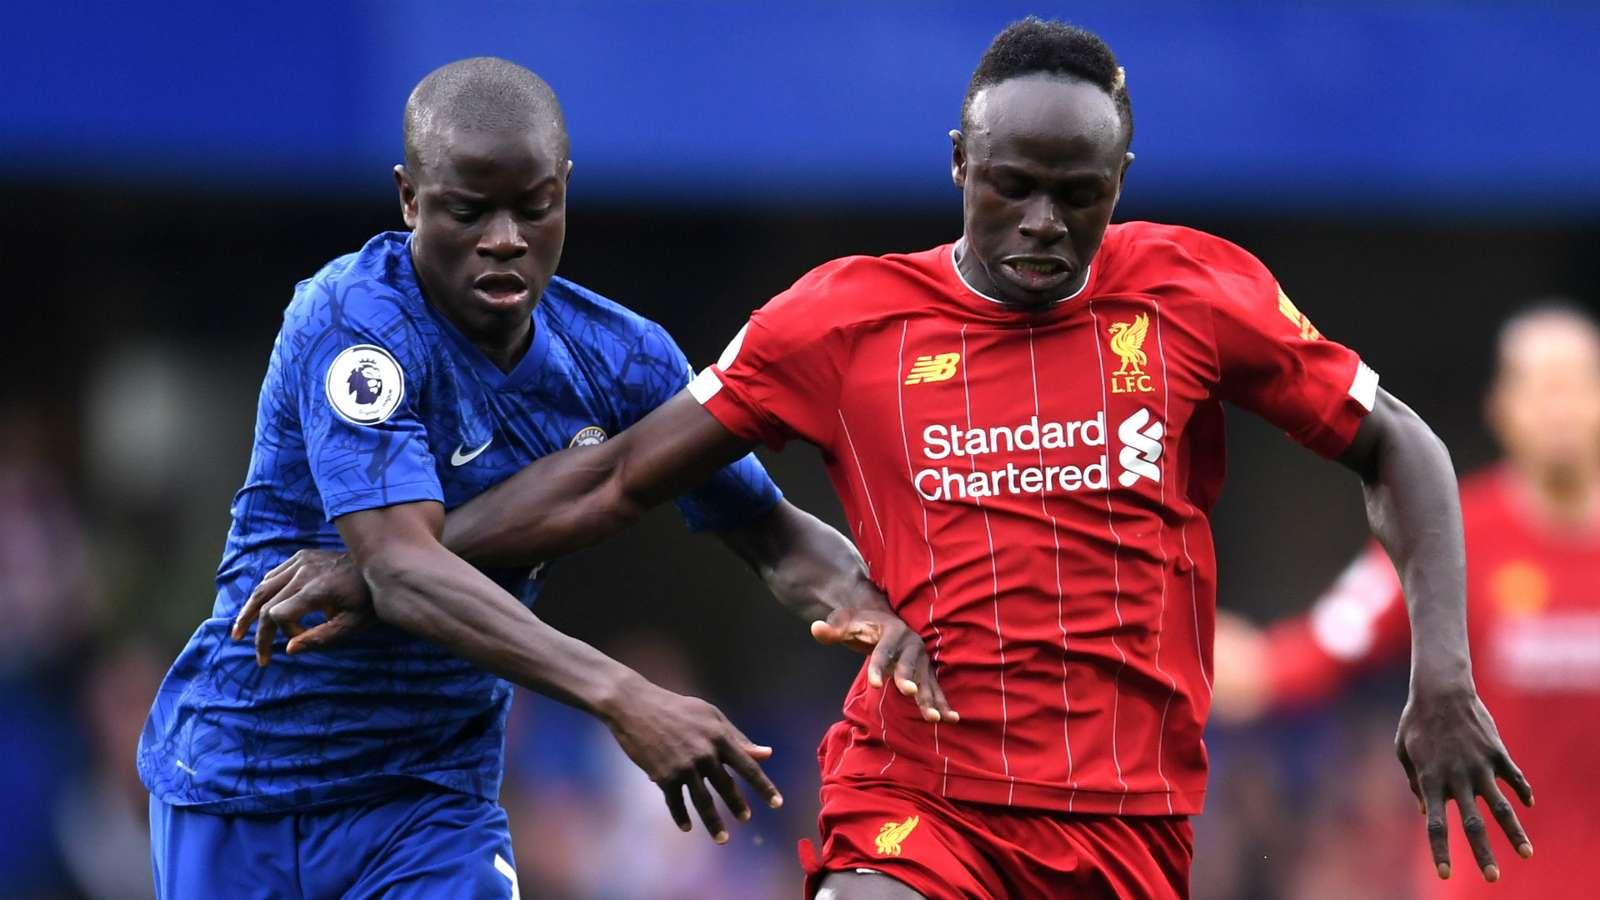 Premier League-Chelsea-France-Liverpool-Senegal-سنگال-فرانسه-لیگ برتر-لیورپول-چلسی